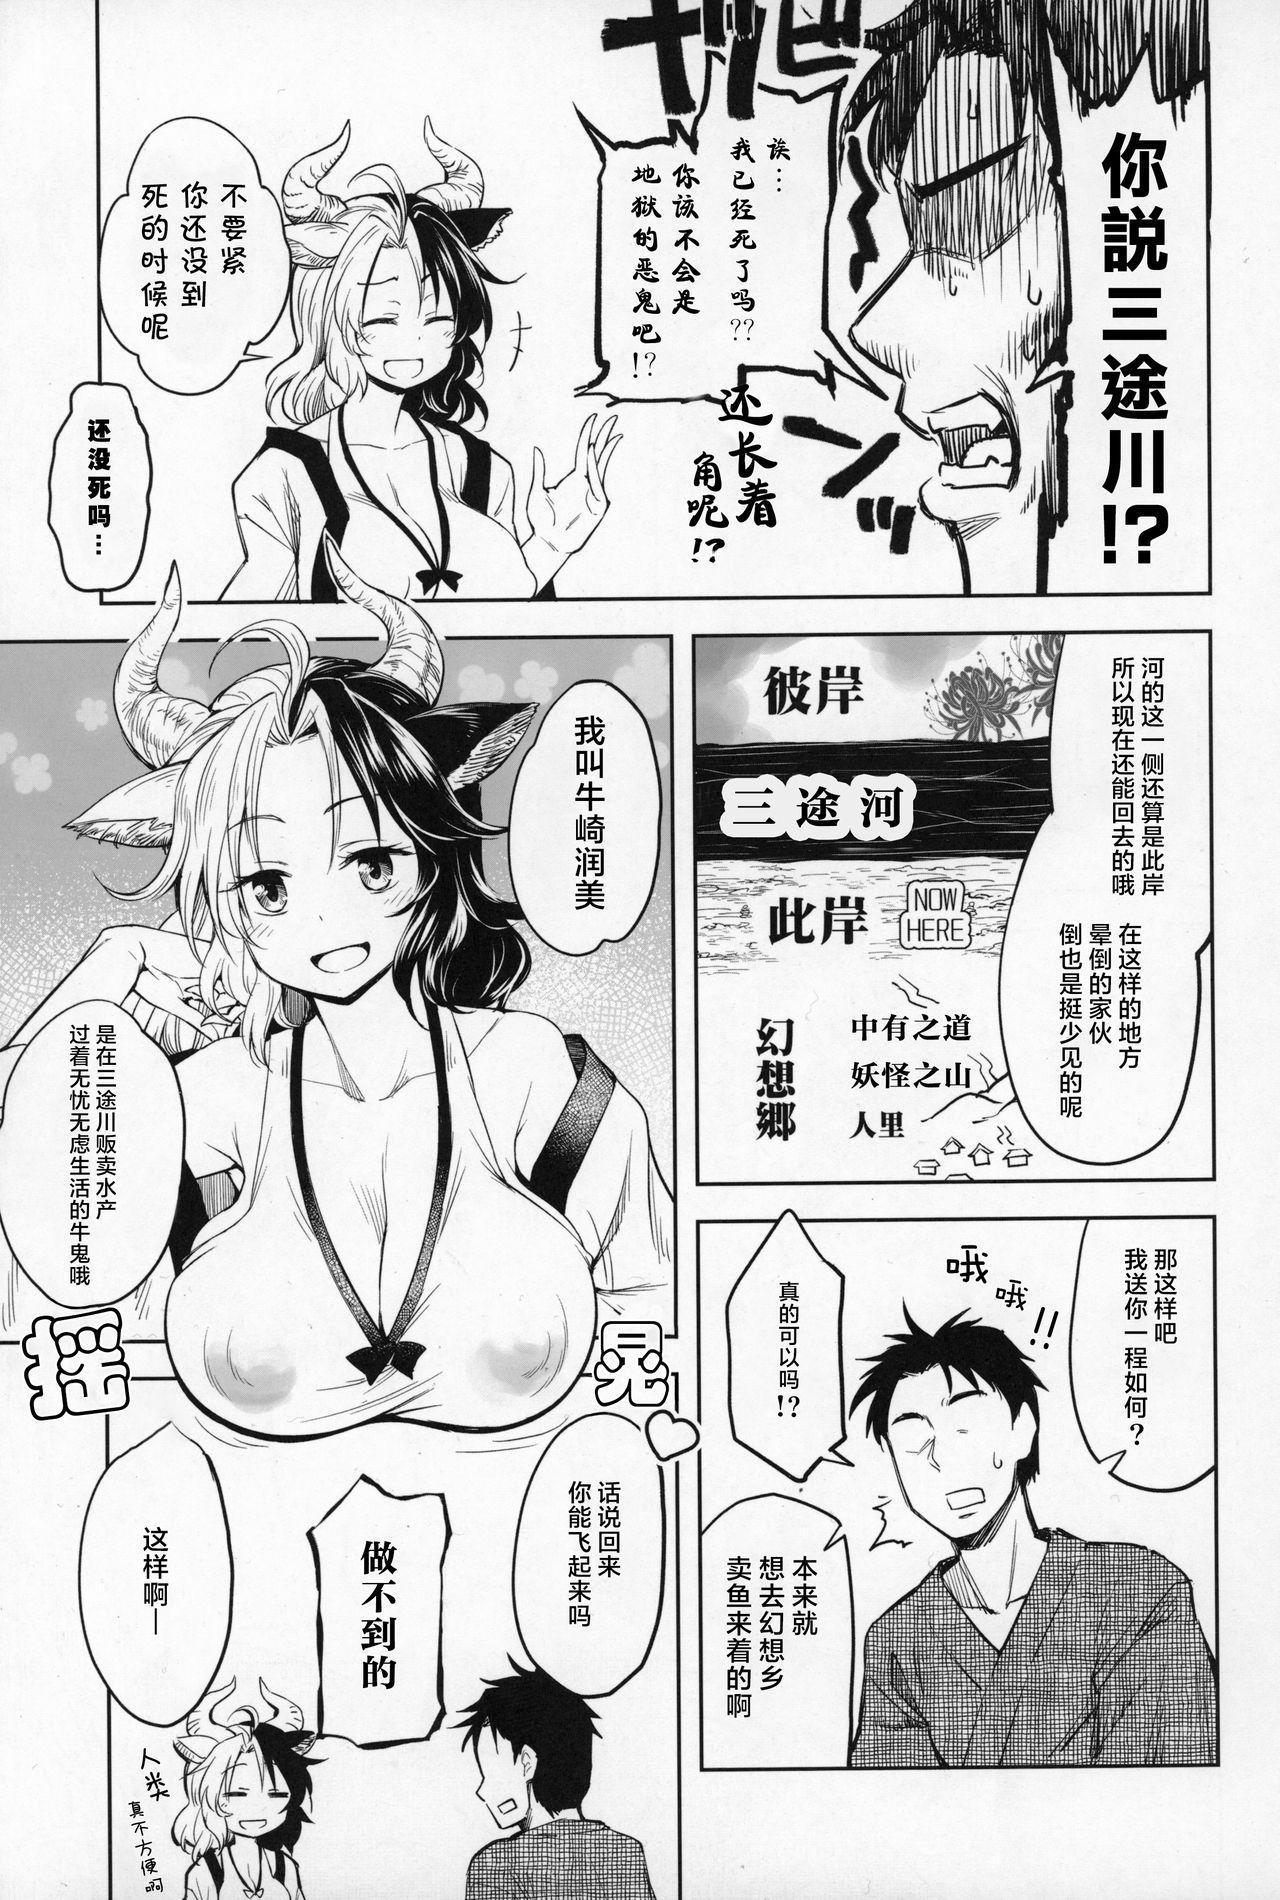 Mendoumi no Ii Ushizaki-san   照顾人的热心牛崎太太 3